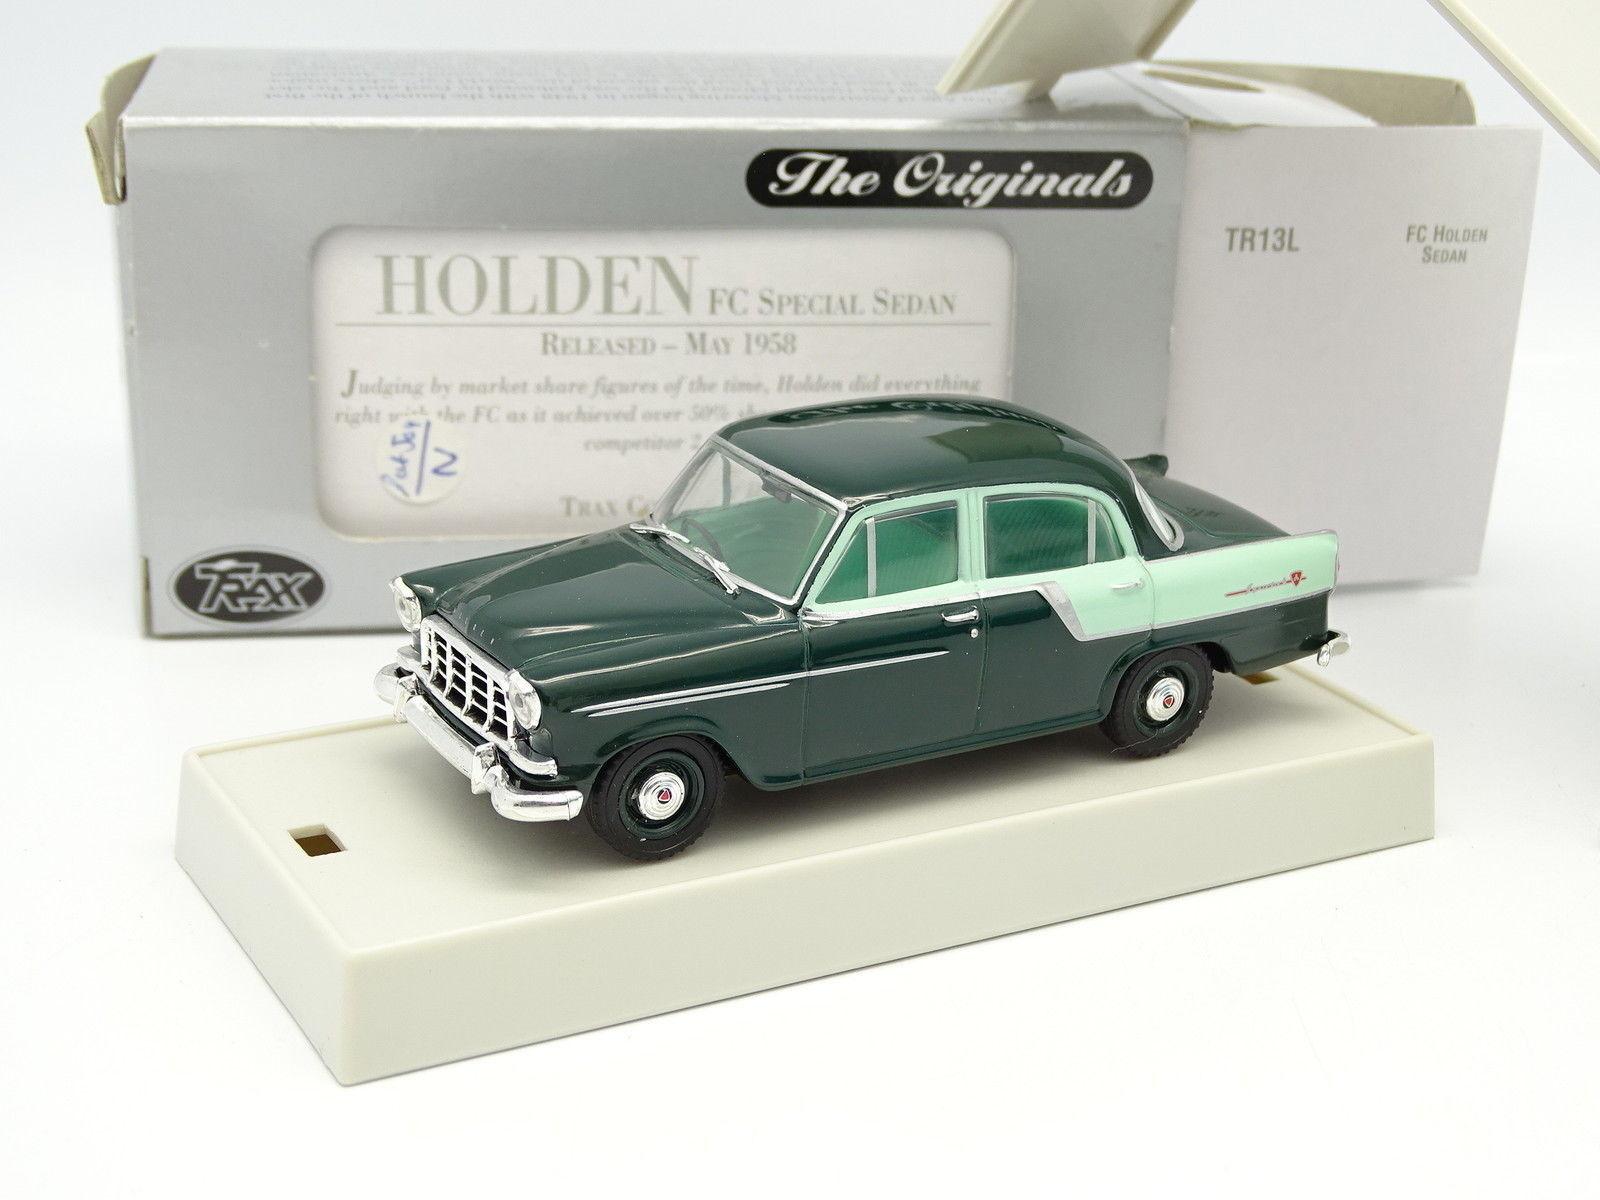 Trax 1 43 - Holden FC Special berlina green 1958 TR13L